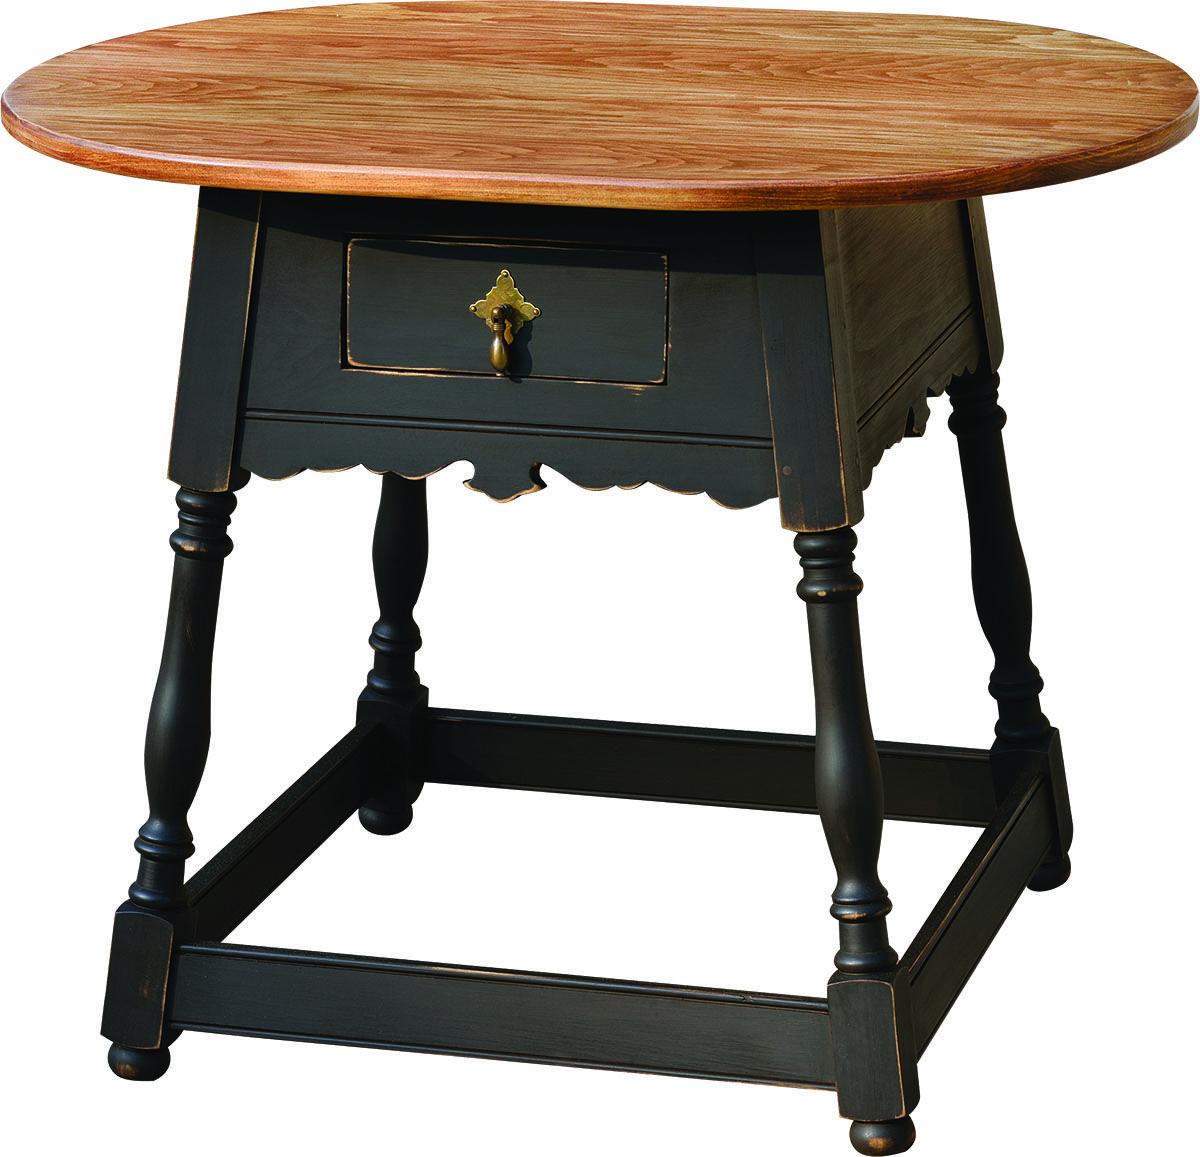 American Heritage Furniture Living Room: American Country Furniture From American Heritage Shop